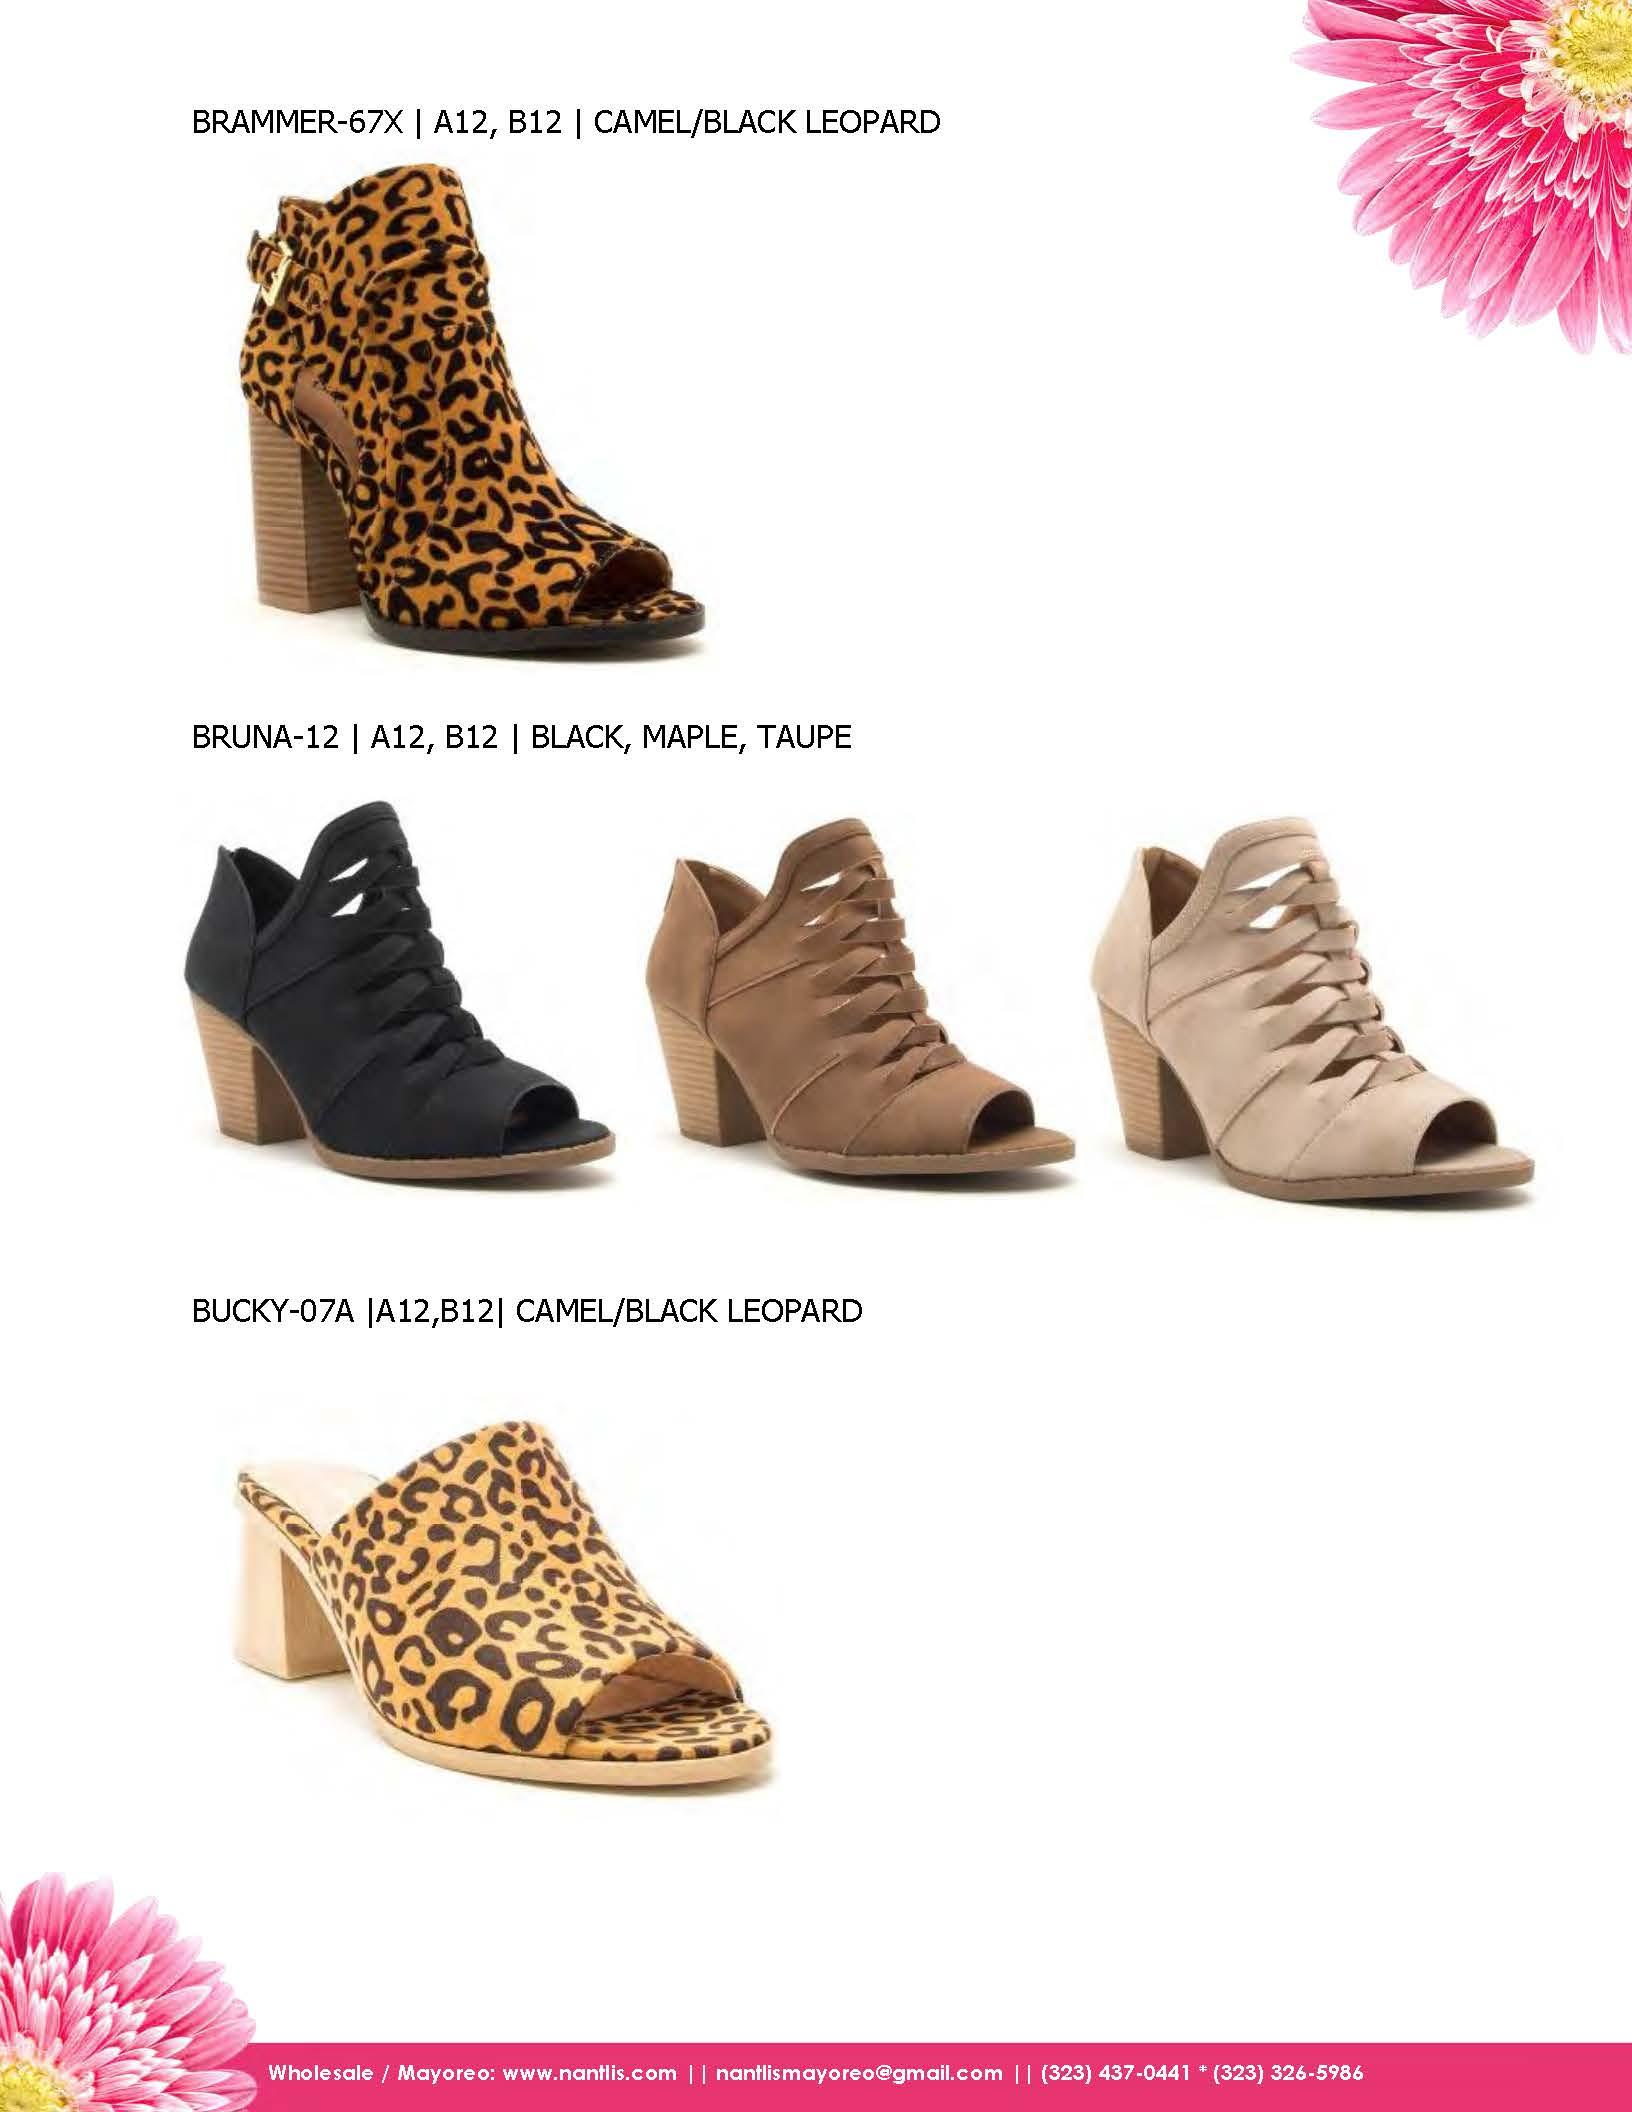 Nantlis Vol QU43 Zapatos para mujer mayoreo Wholesale shoes for women_Page_08